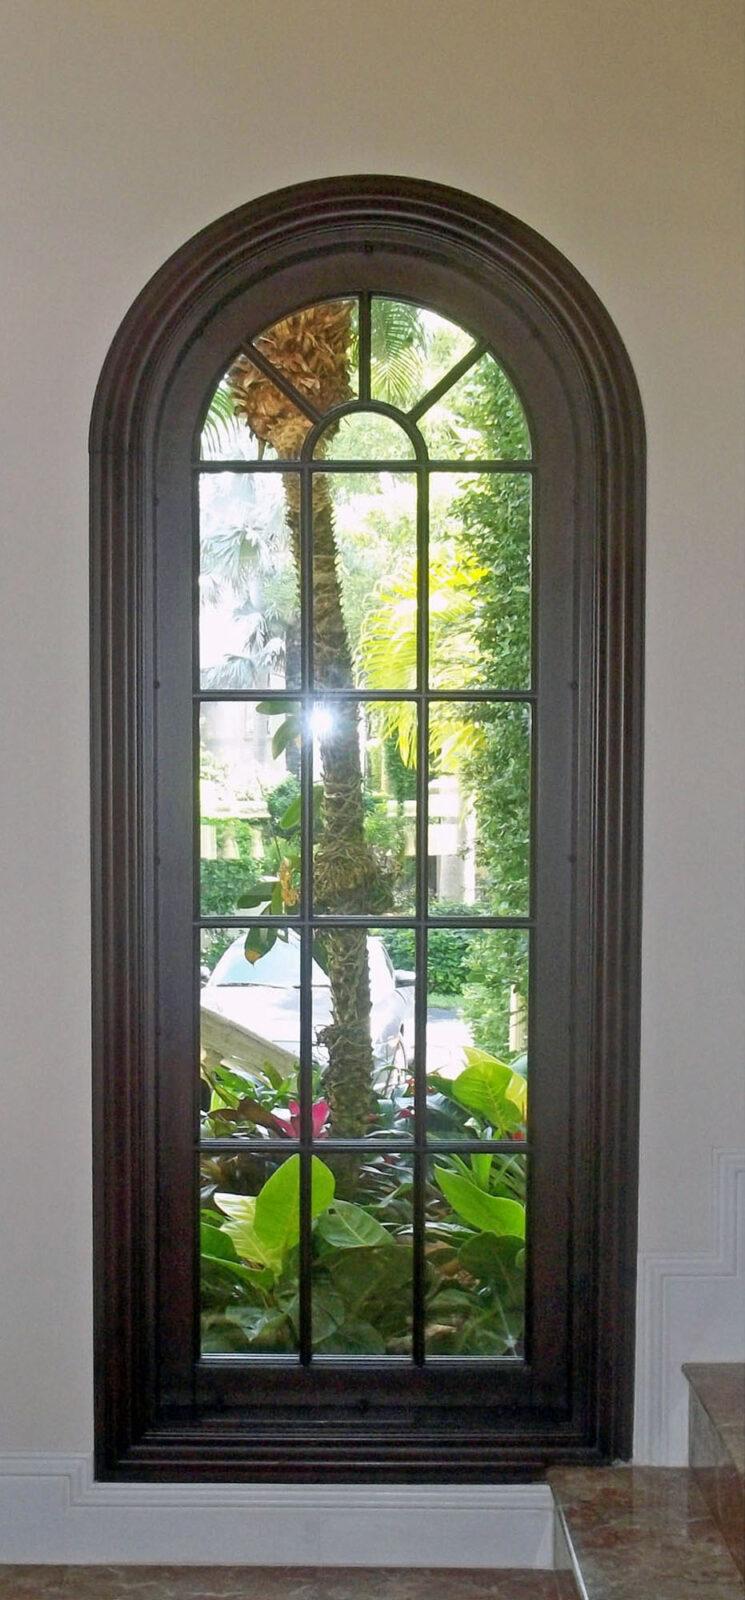 COCOPLUM MAHOGANY WINDOW